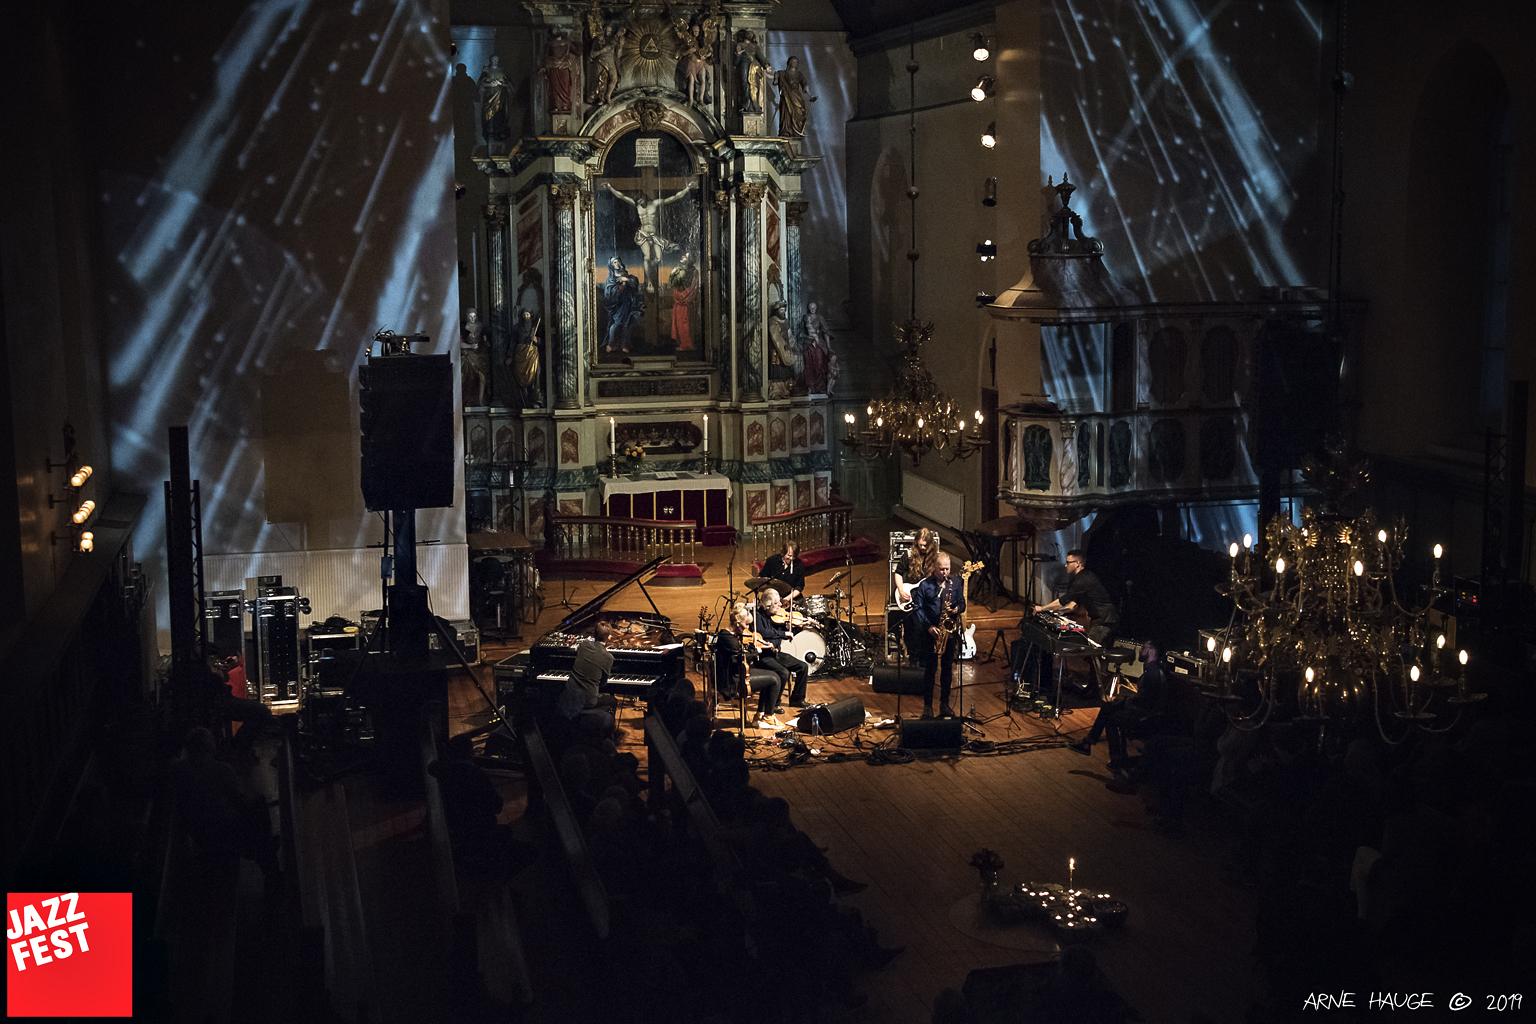 Karl Seglers WorldJazz i Vår Frue kirke. Foto: Arne Hauge